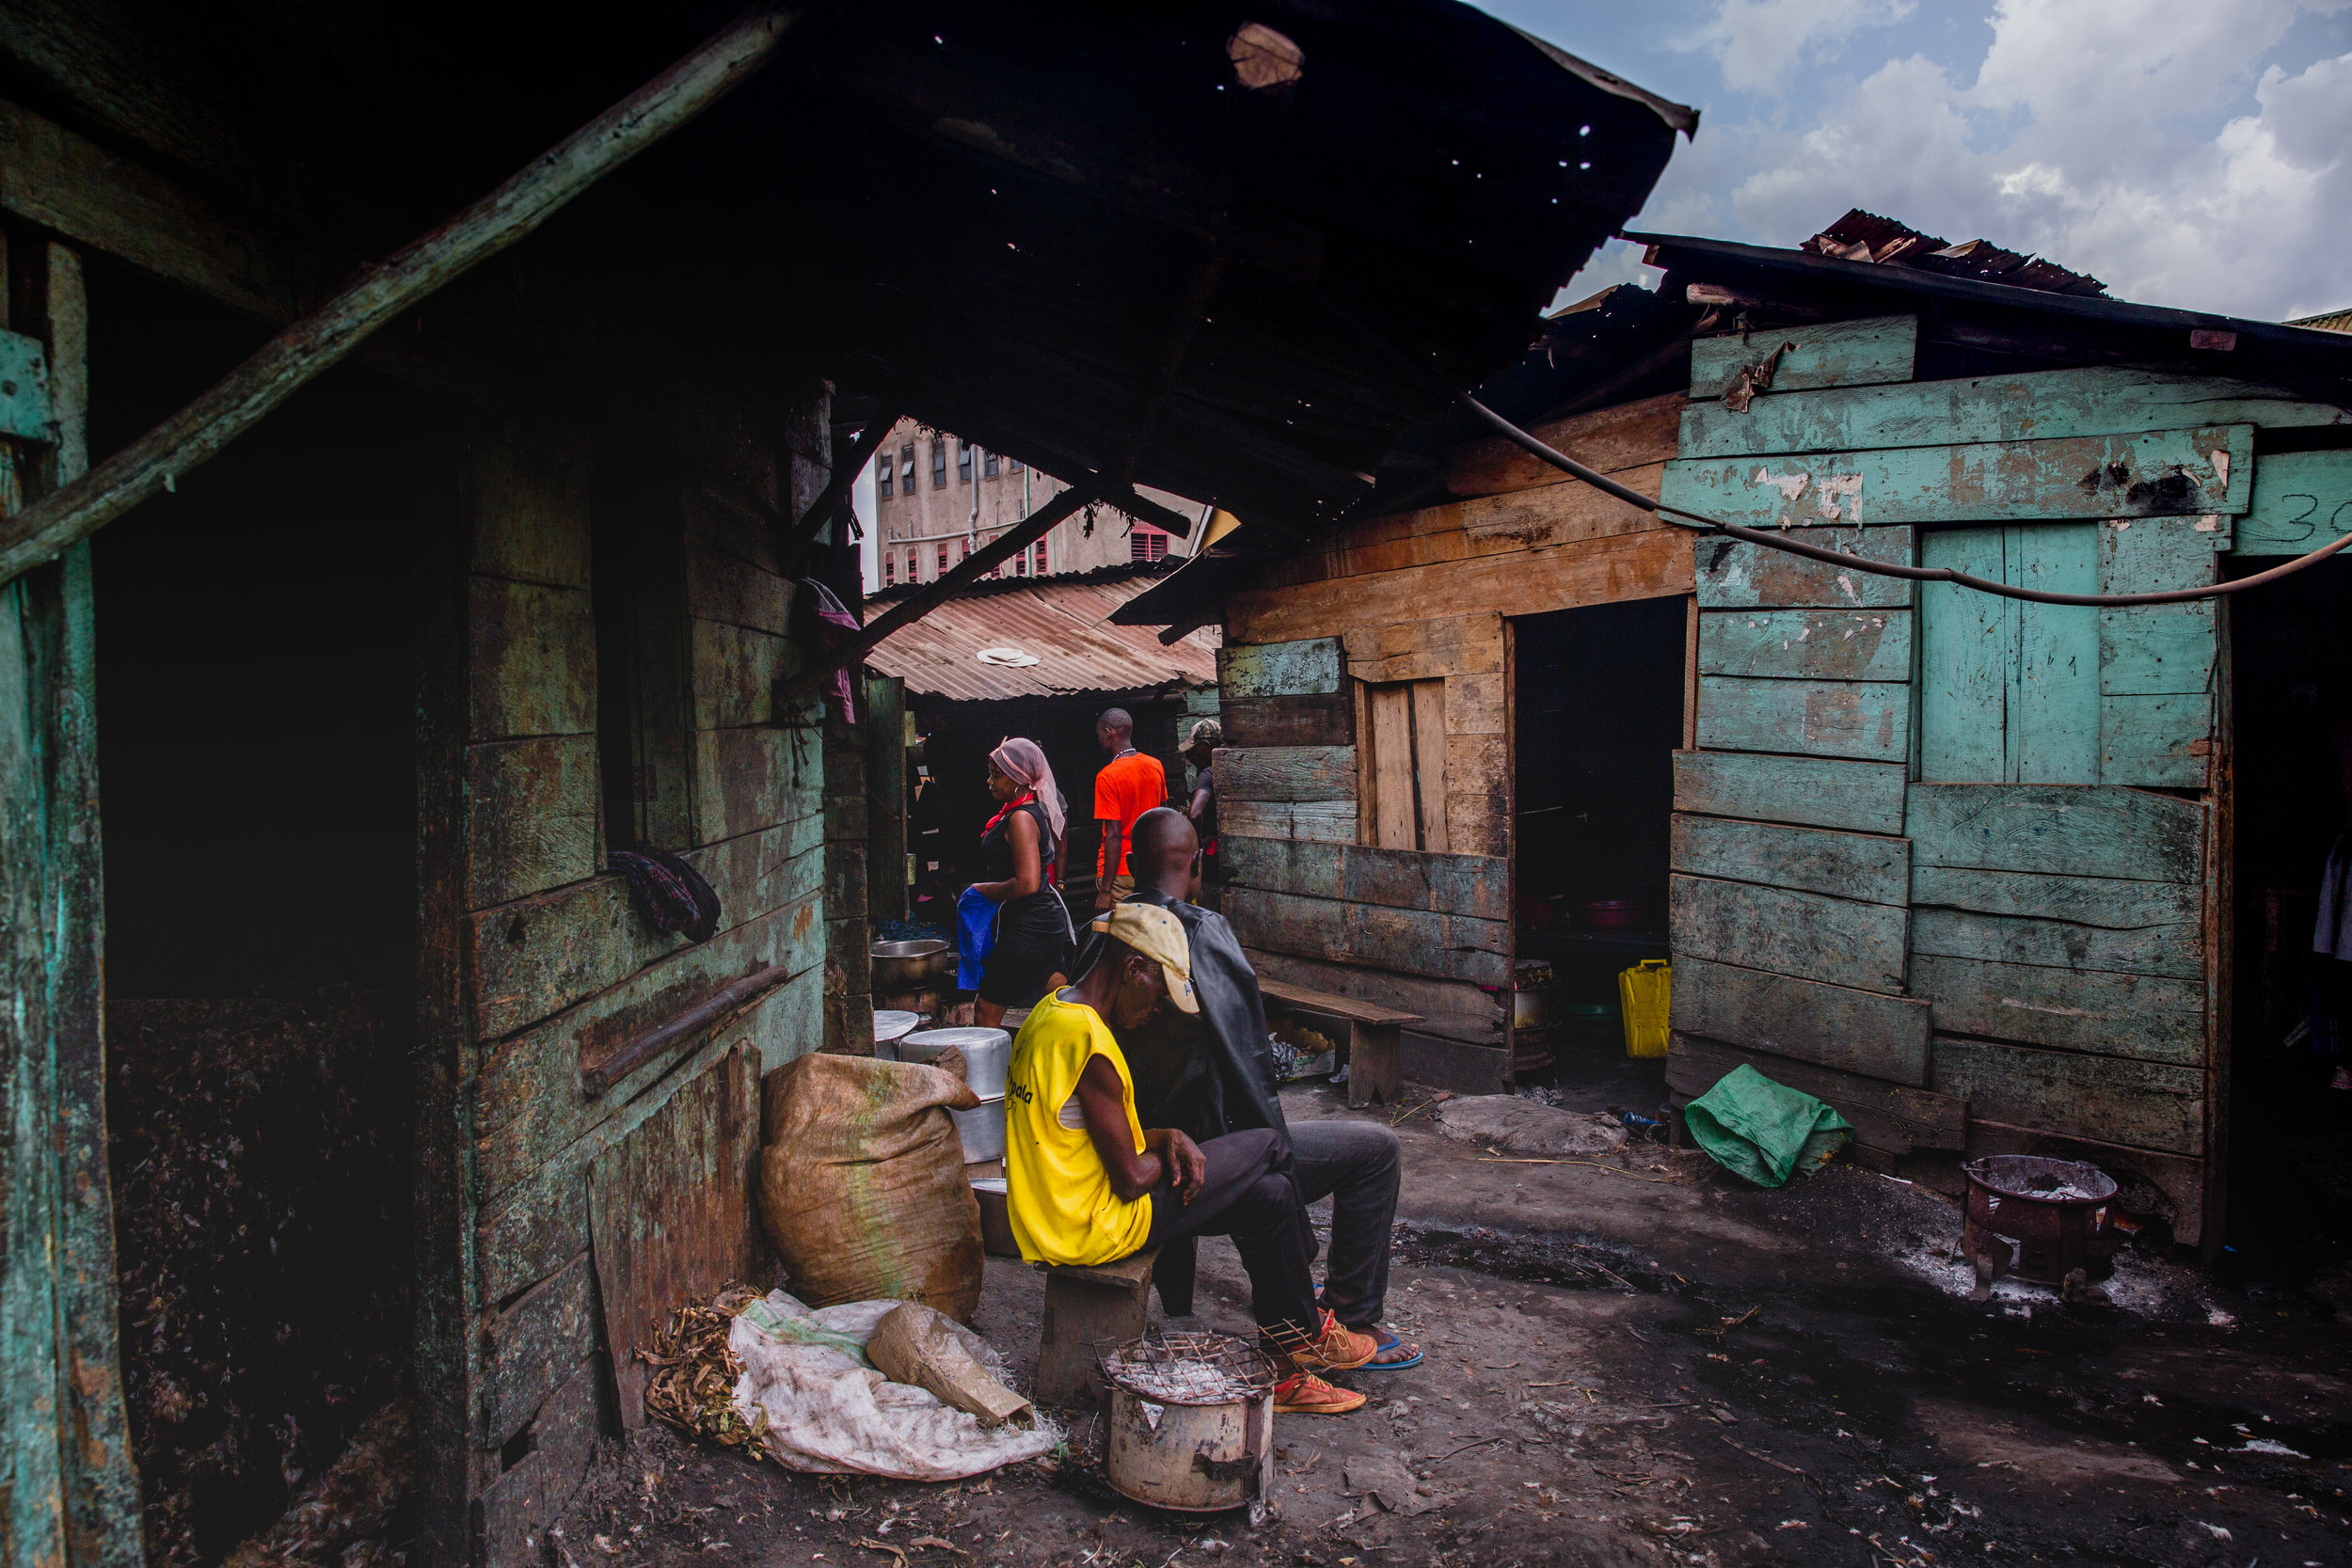 UgandastreetPhotos-32.jpg